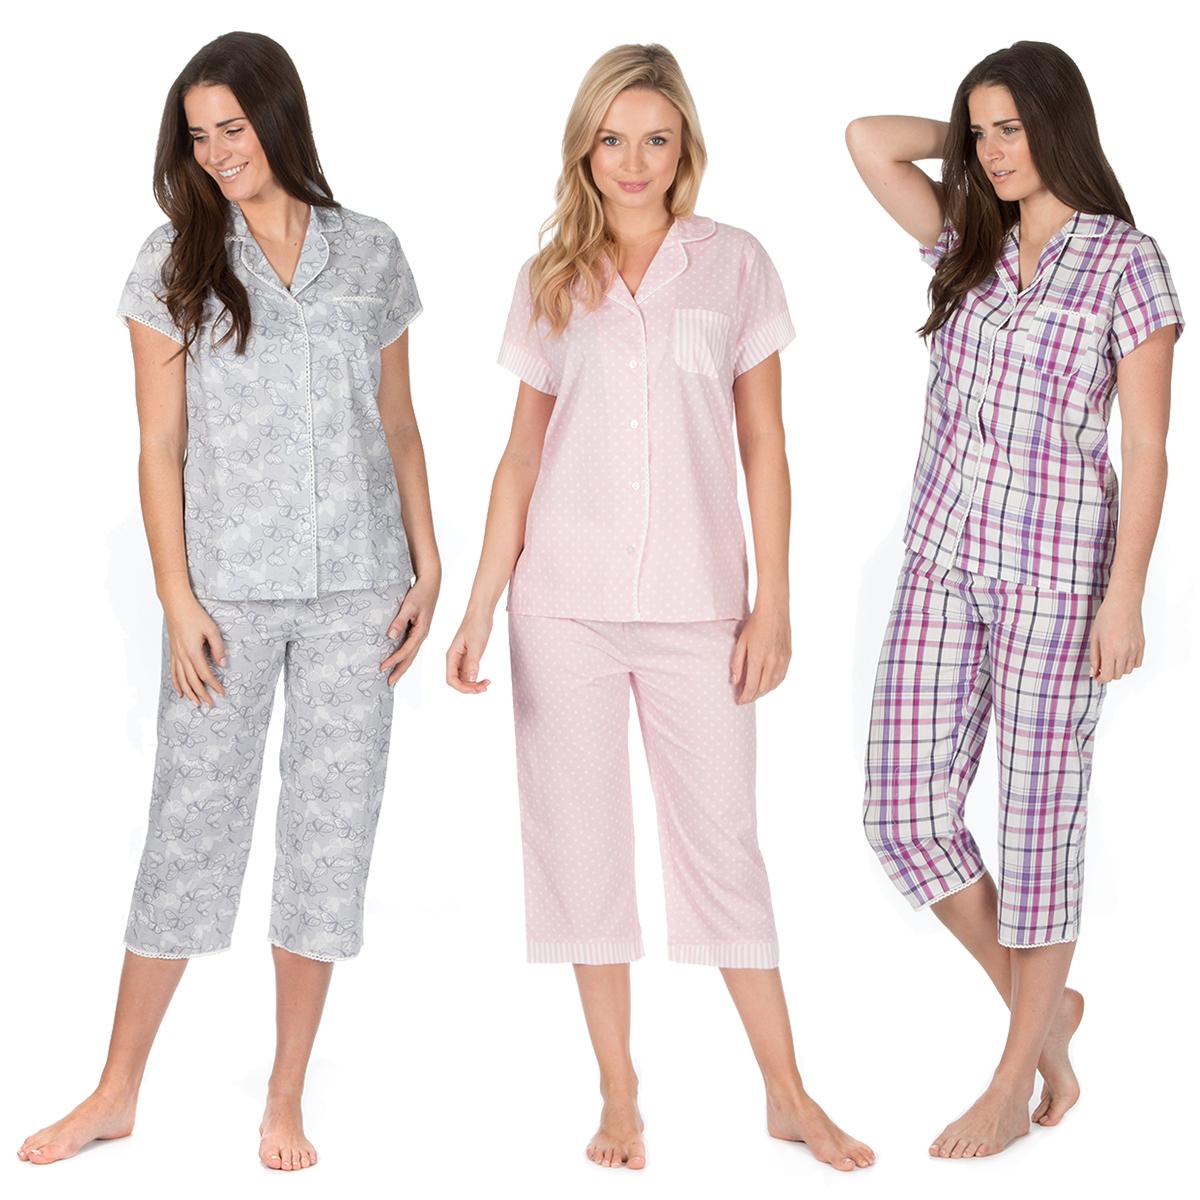 Ladies Short Sleeve Pyjama Set Three Quarter Length Bottoms 100% Cotton PJs  New a586889e24